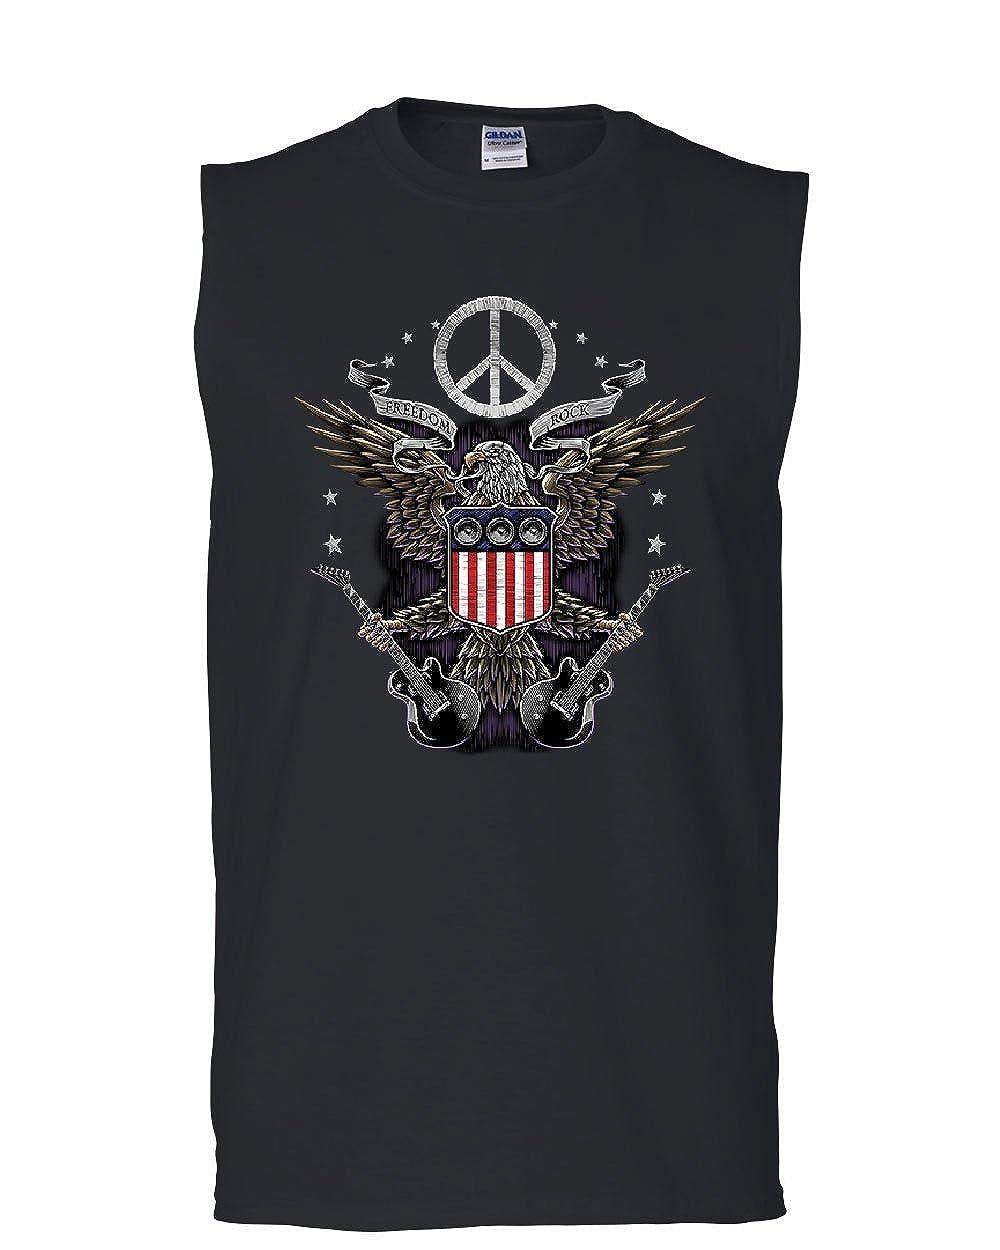 Tee Hunt Freedom Rock Muscle Shirt Peace American Flag Bald Eagle 4th of July Sleeveless